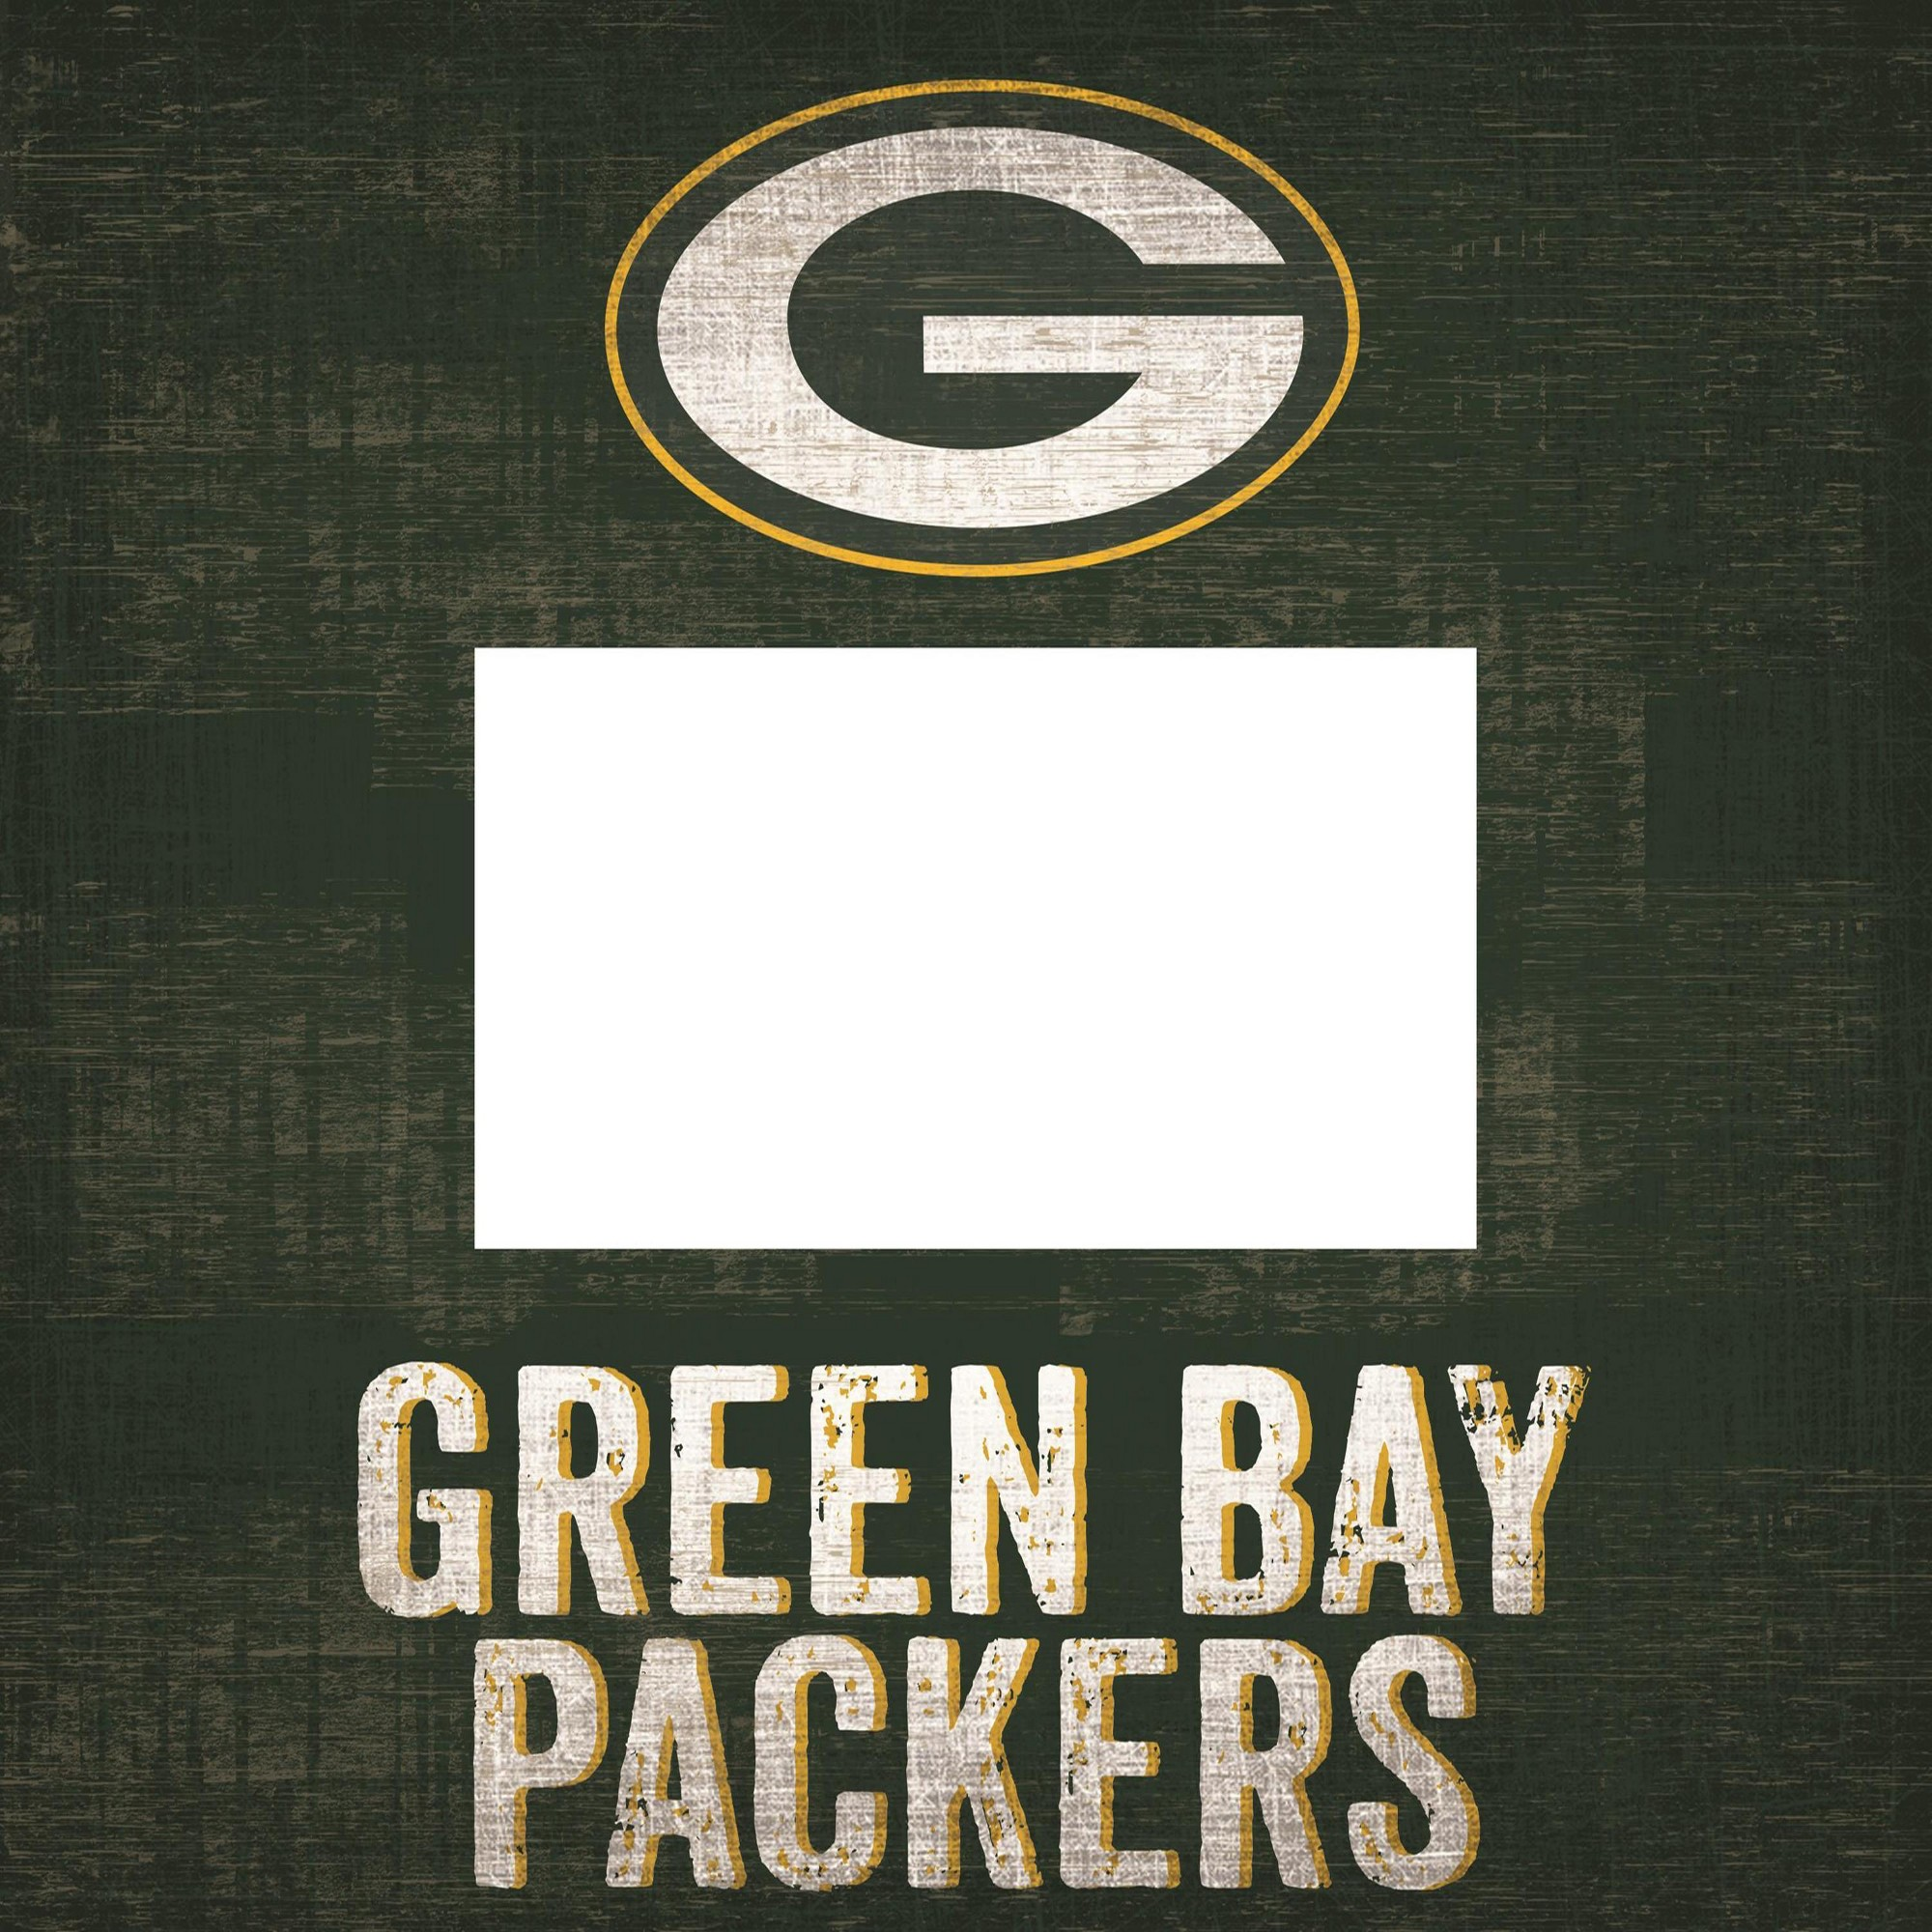 Green bay press gazette griffin pecore - Google Search | Pictures ...